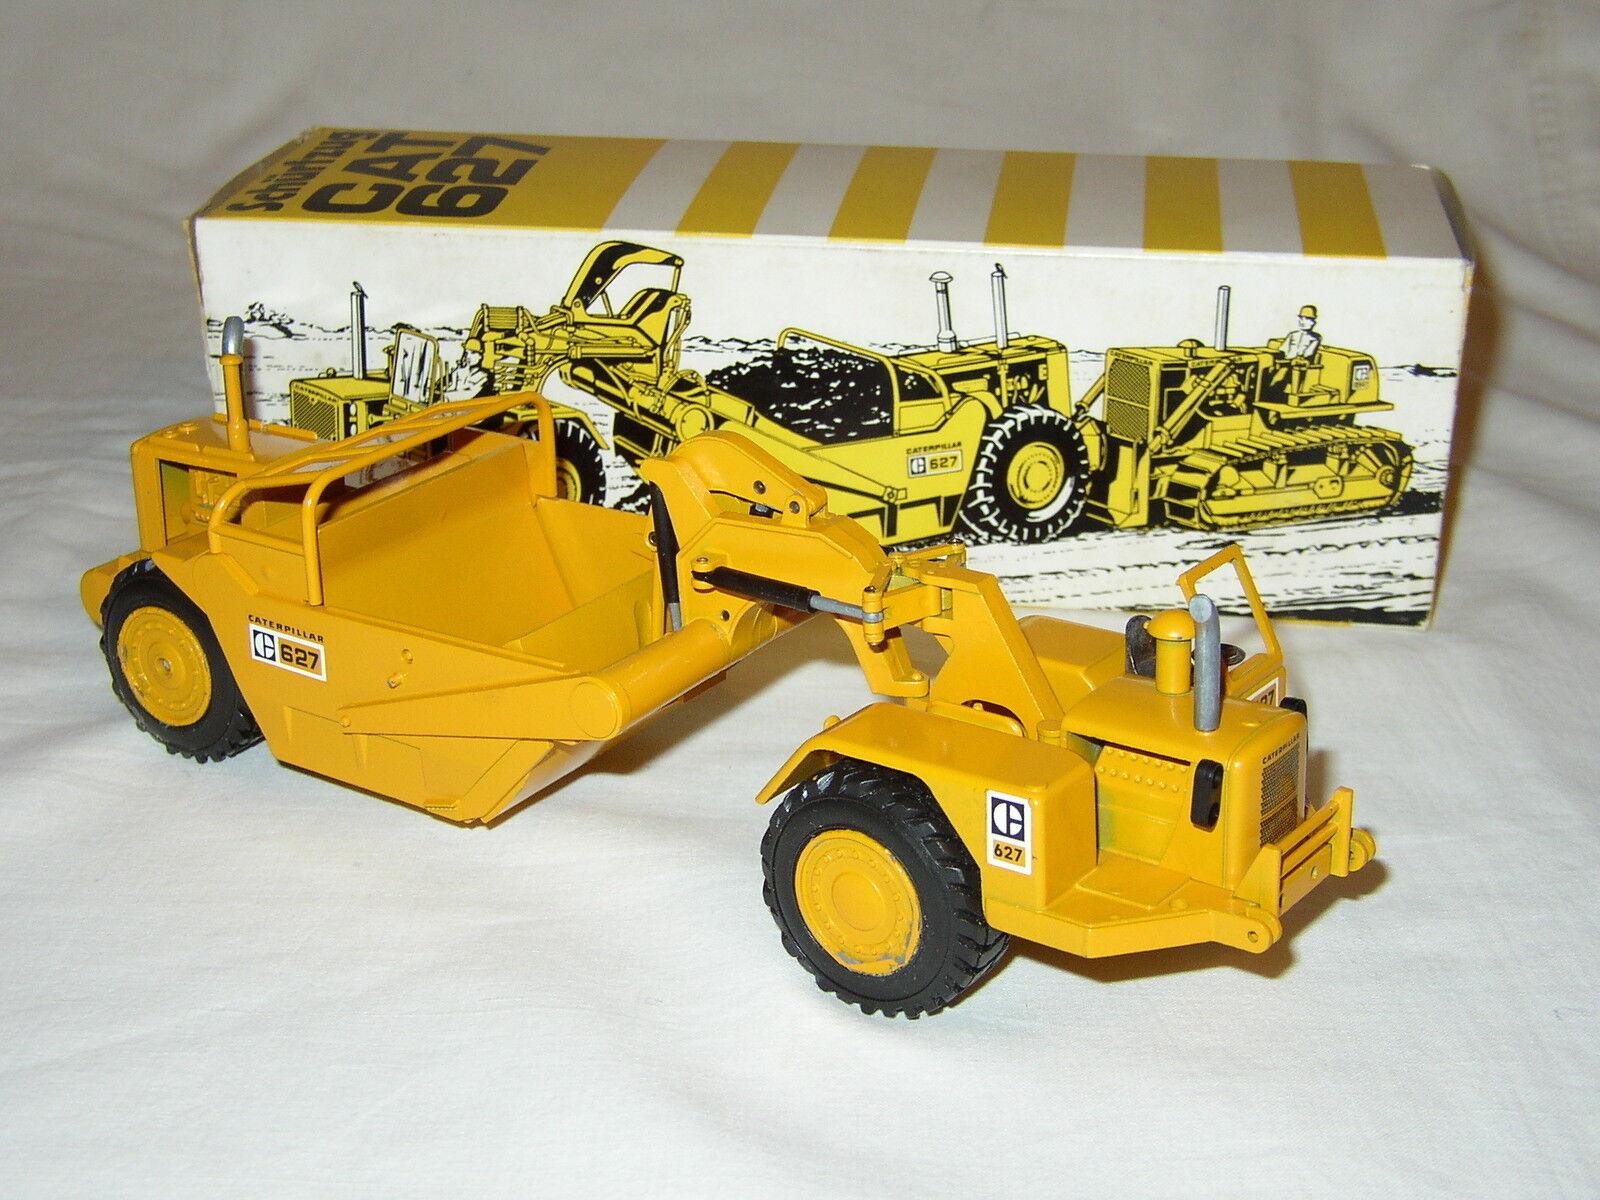 CATERPILLAR CAT 627 TANDEM POWErouge SCRAPER NON P P - NZG  126 - 1 50 M – N M BOX